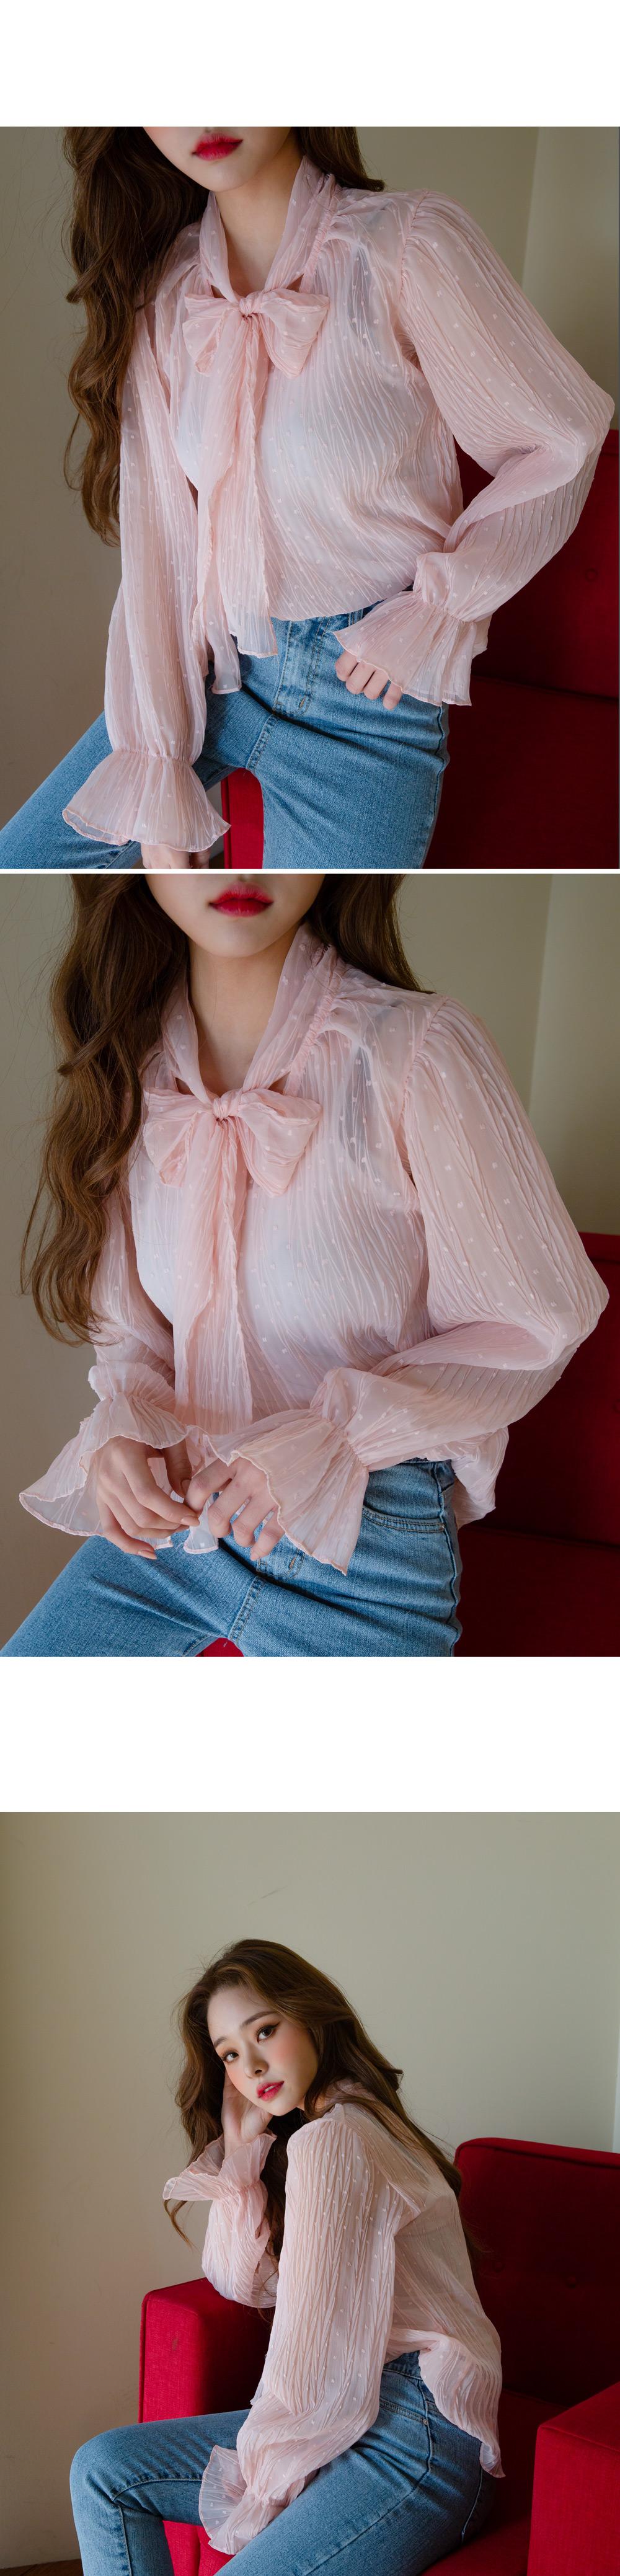 Pearl Foat Skirt